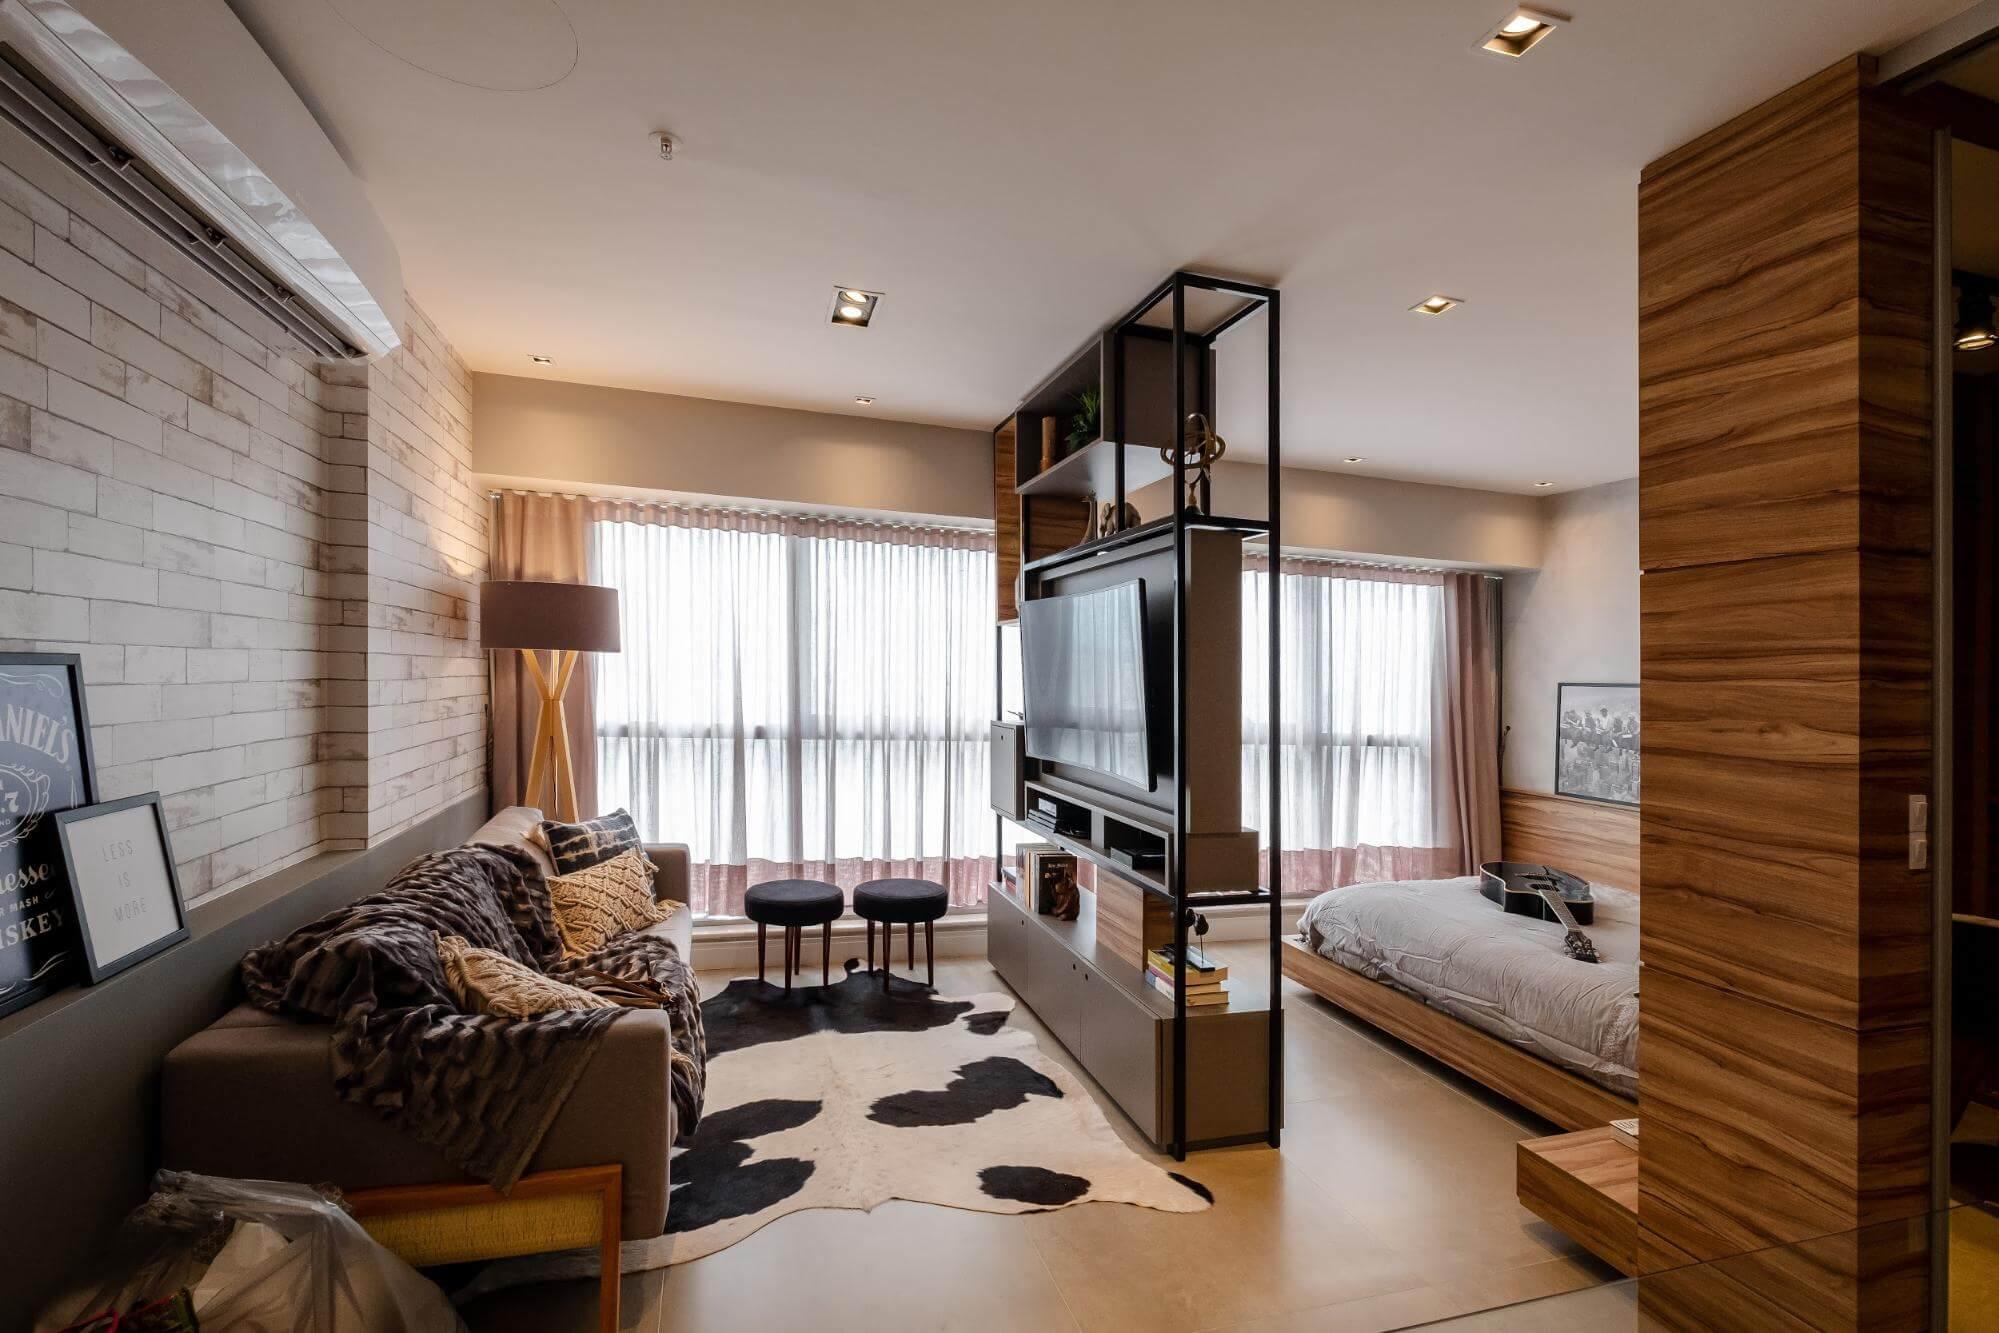 Apartamento pequeno - puffs